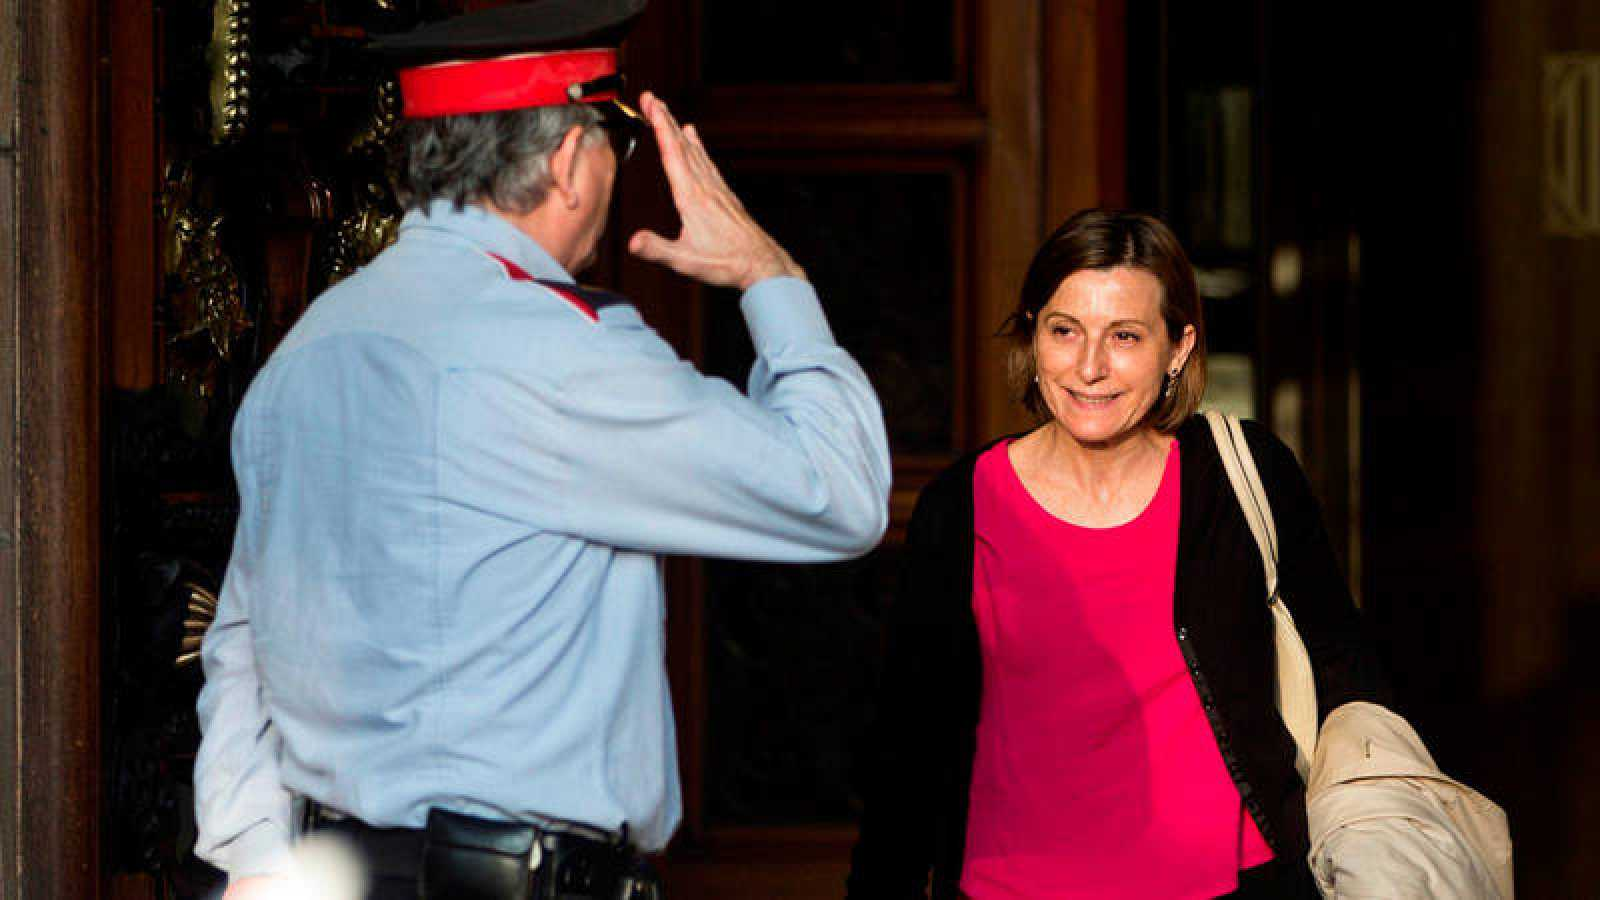 La presidenta del Parlament, Carme Forcadell, a su salida de la cámara autonómica